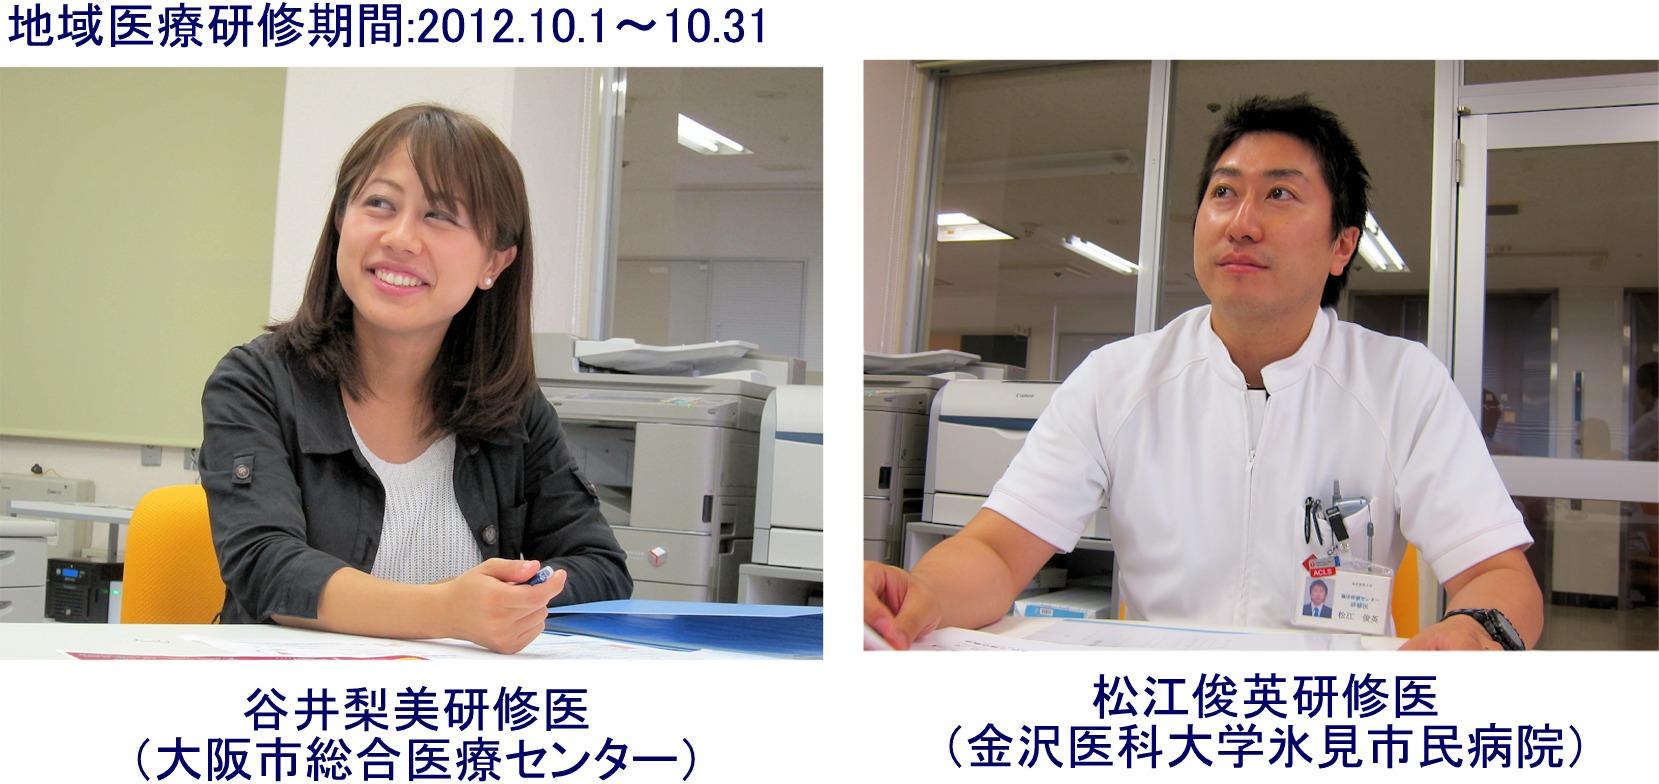 kensyui20121001.jpg